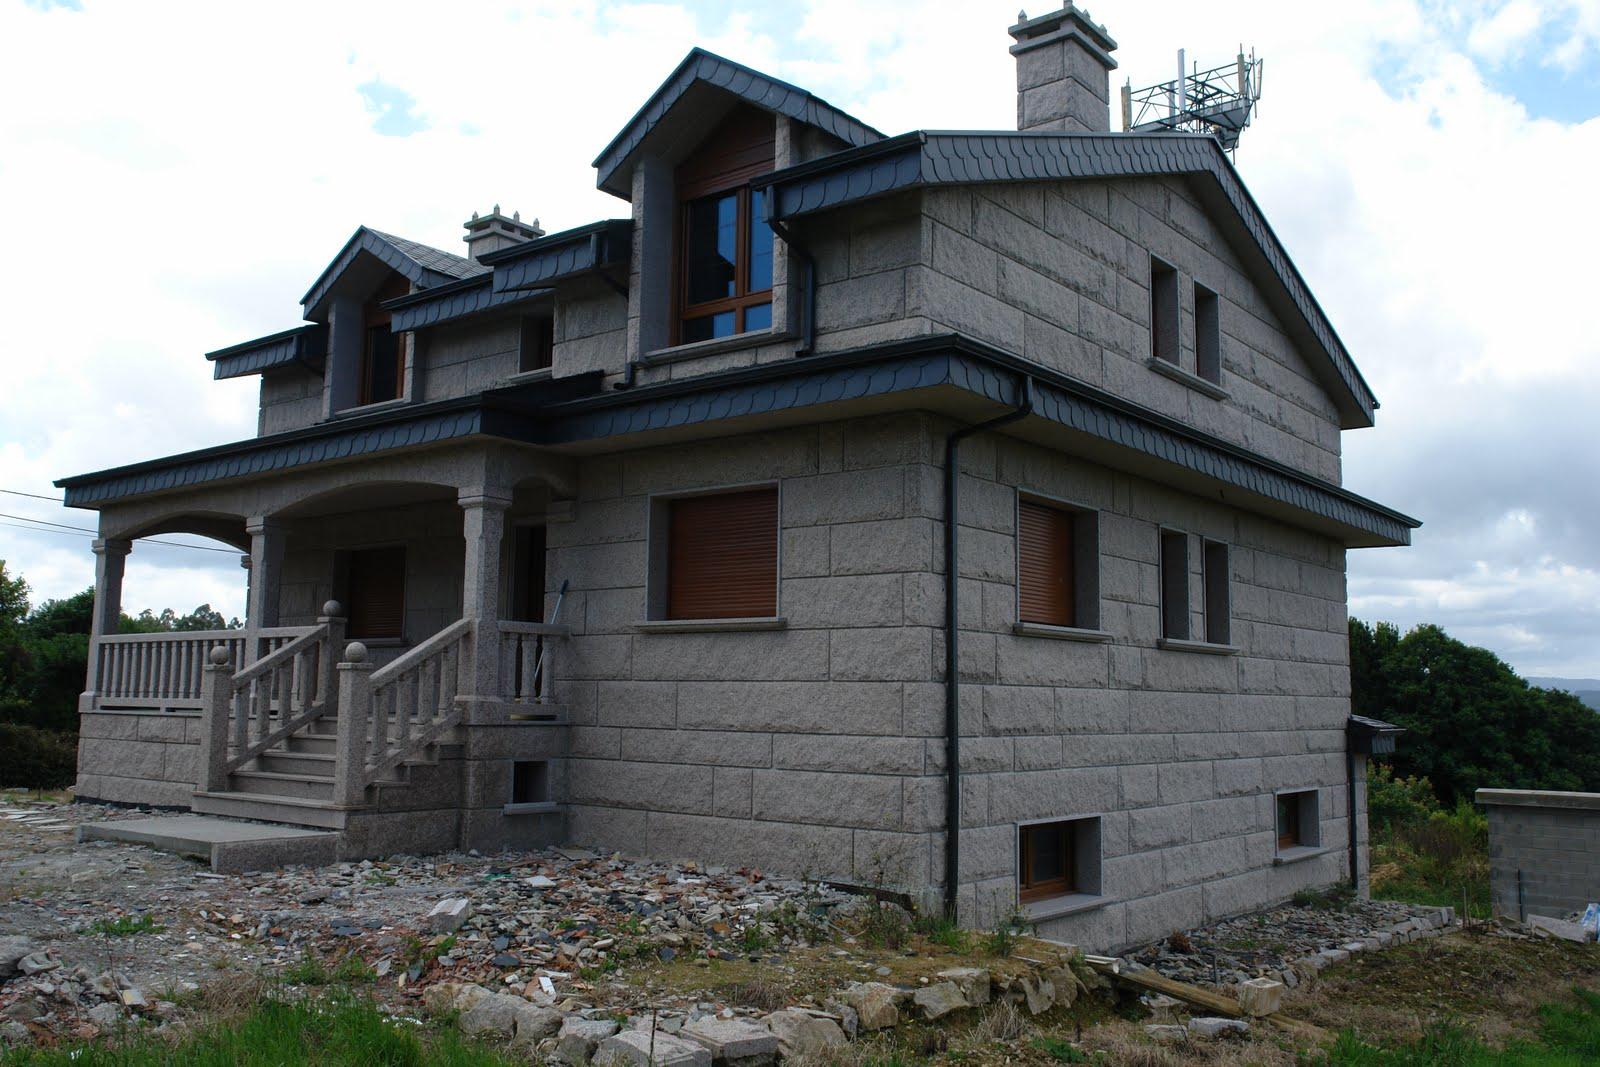 Arquitectura t cnica mir s vivienda unifamiliar en piedra for Arquitectura tecnica ull